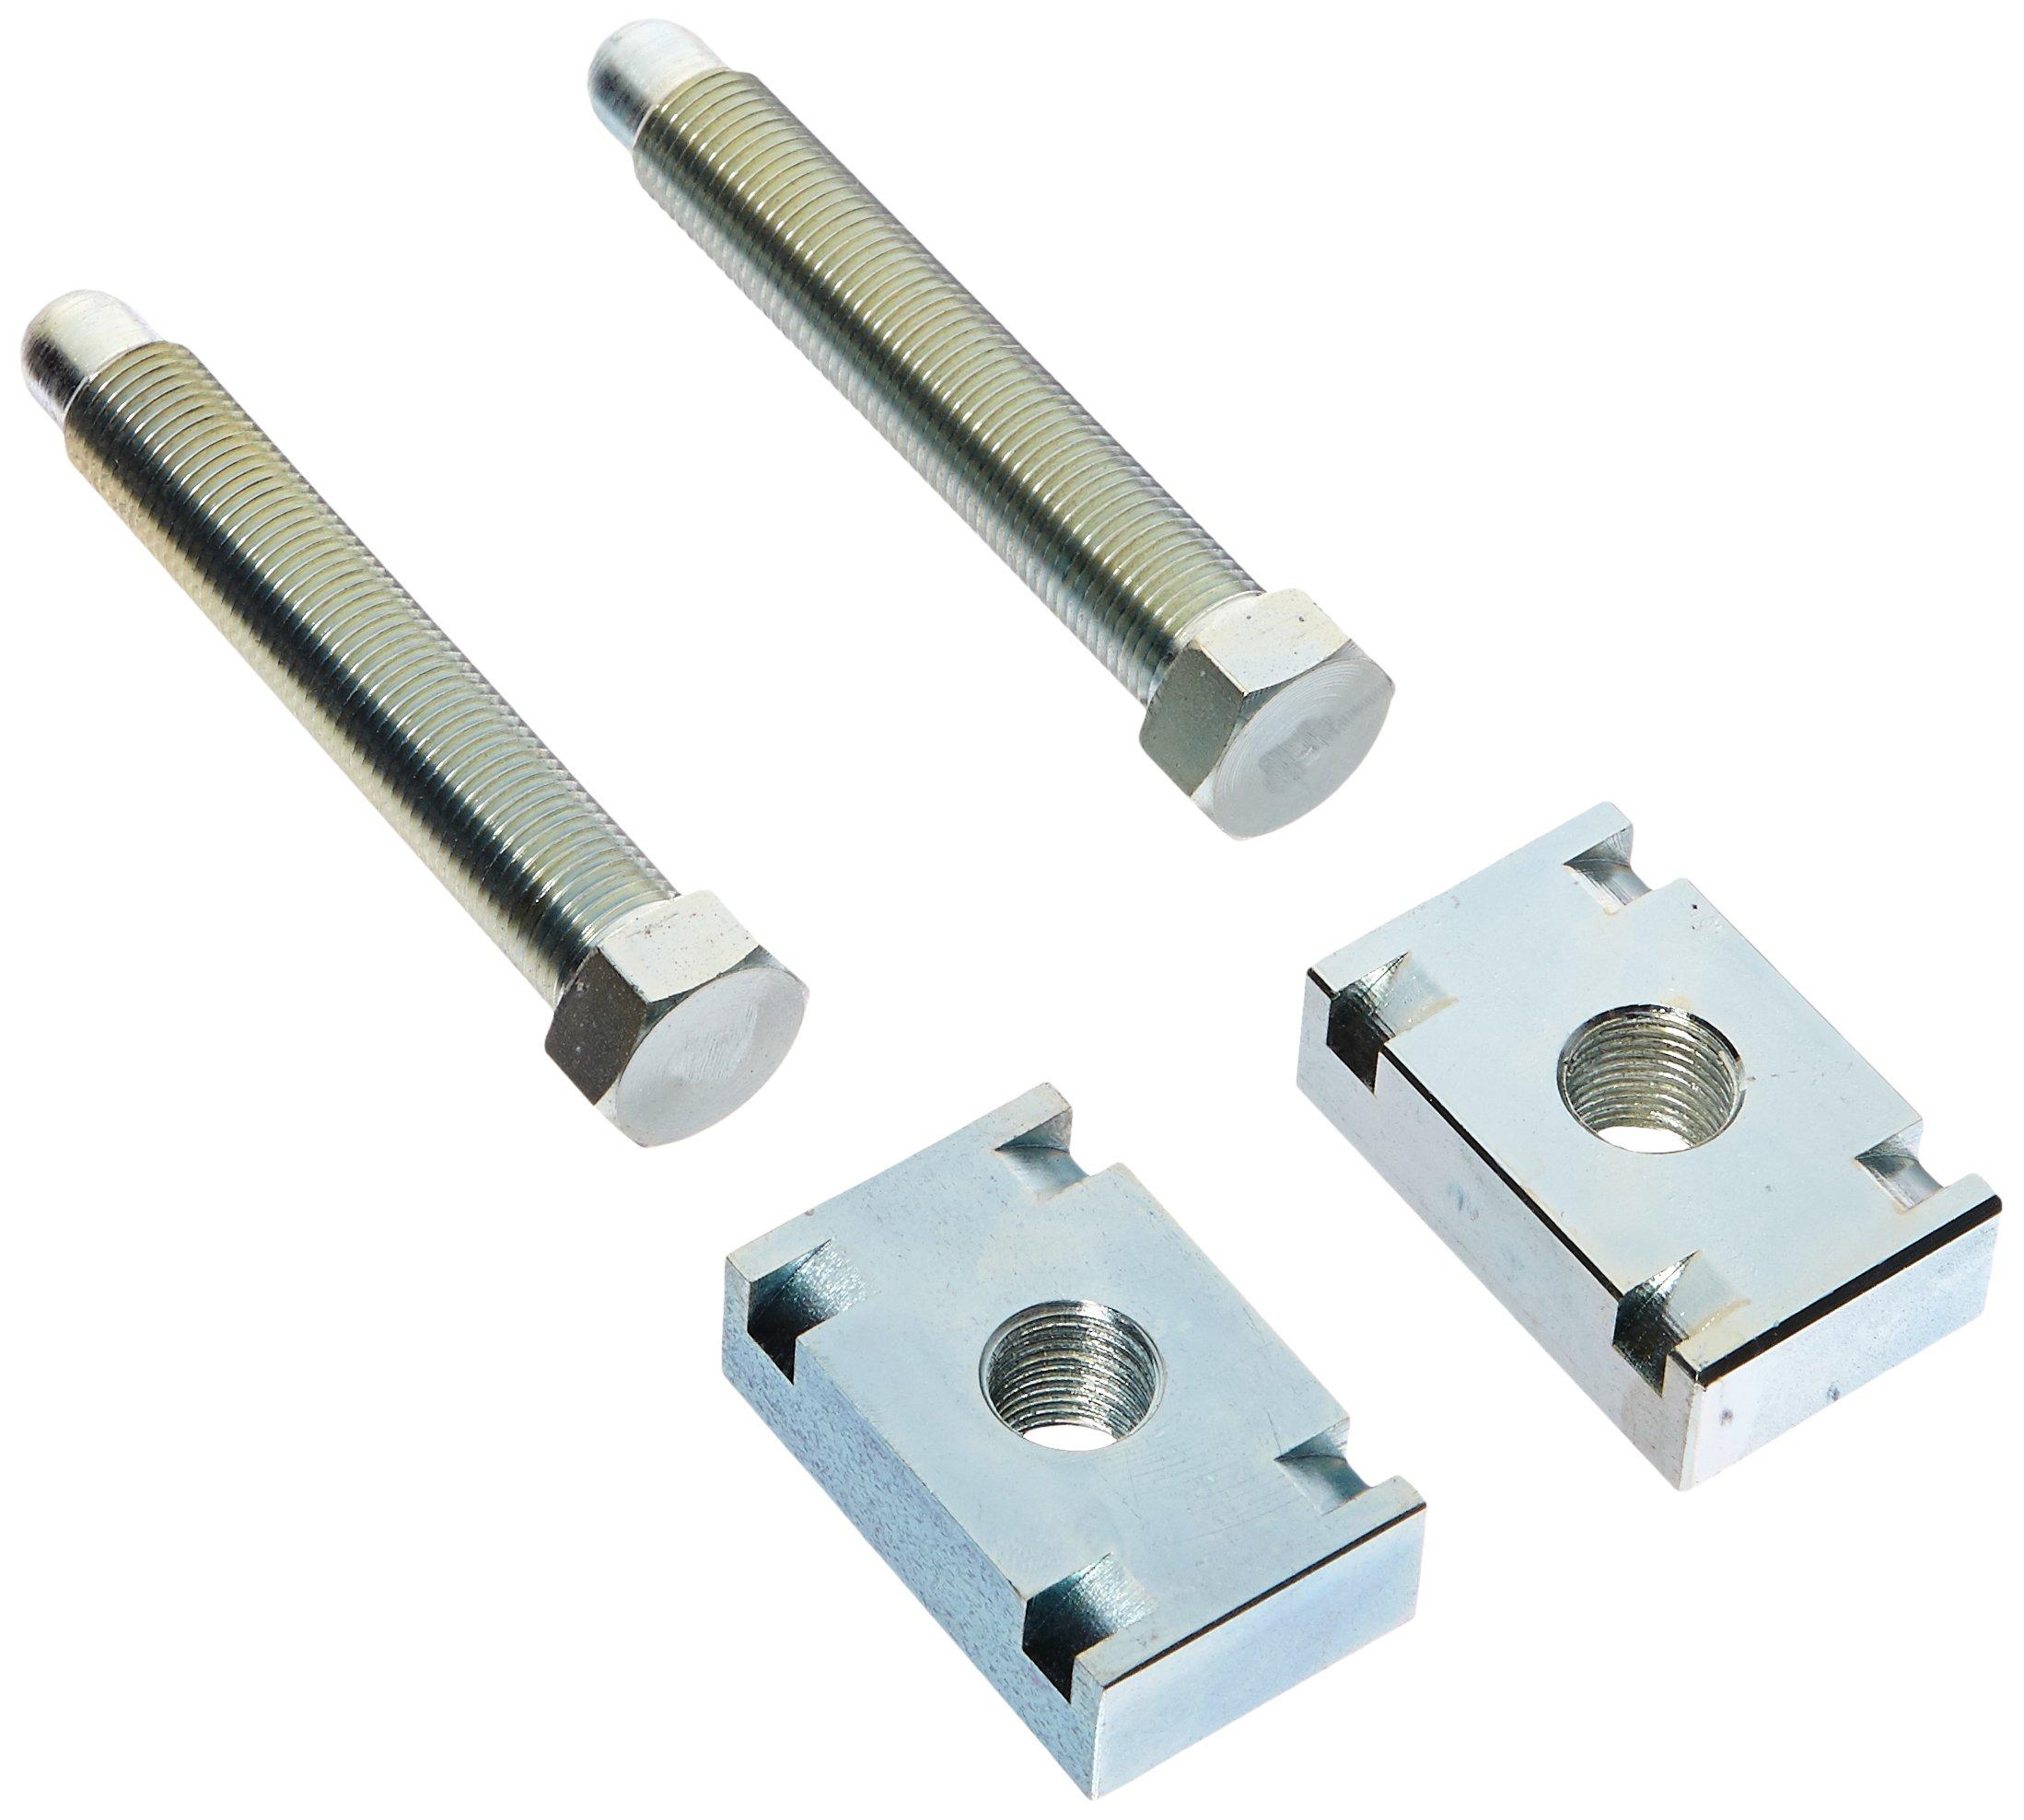 QA1 52360 Torsion Bar Adjuster Kit